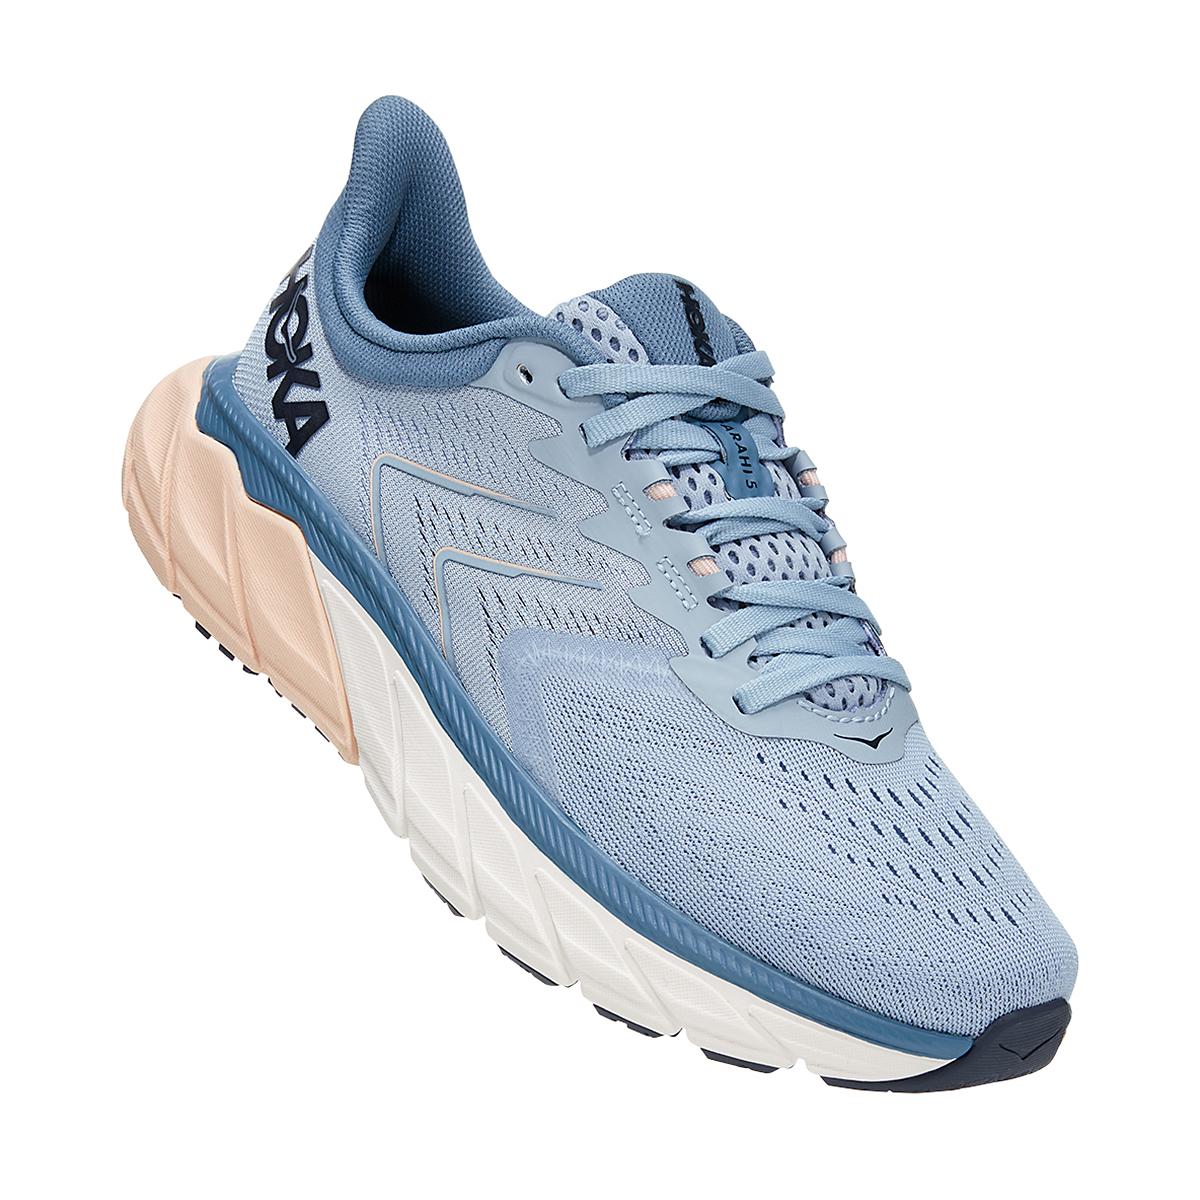 Women's Hoka One One Arahi 5 Running Shoe - Color: Blue Fog/Provincial Blue - Size: 5 - Width: Regular, Blue Fog/Provincial Blue, large, image 2